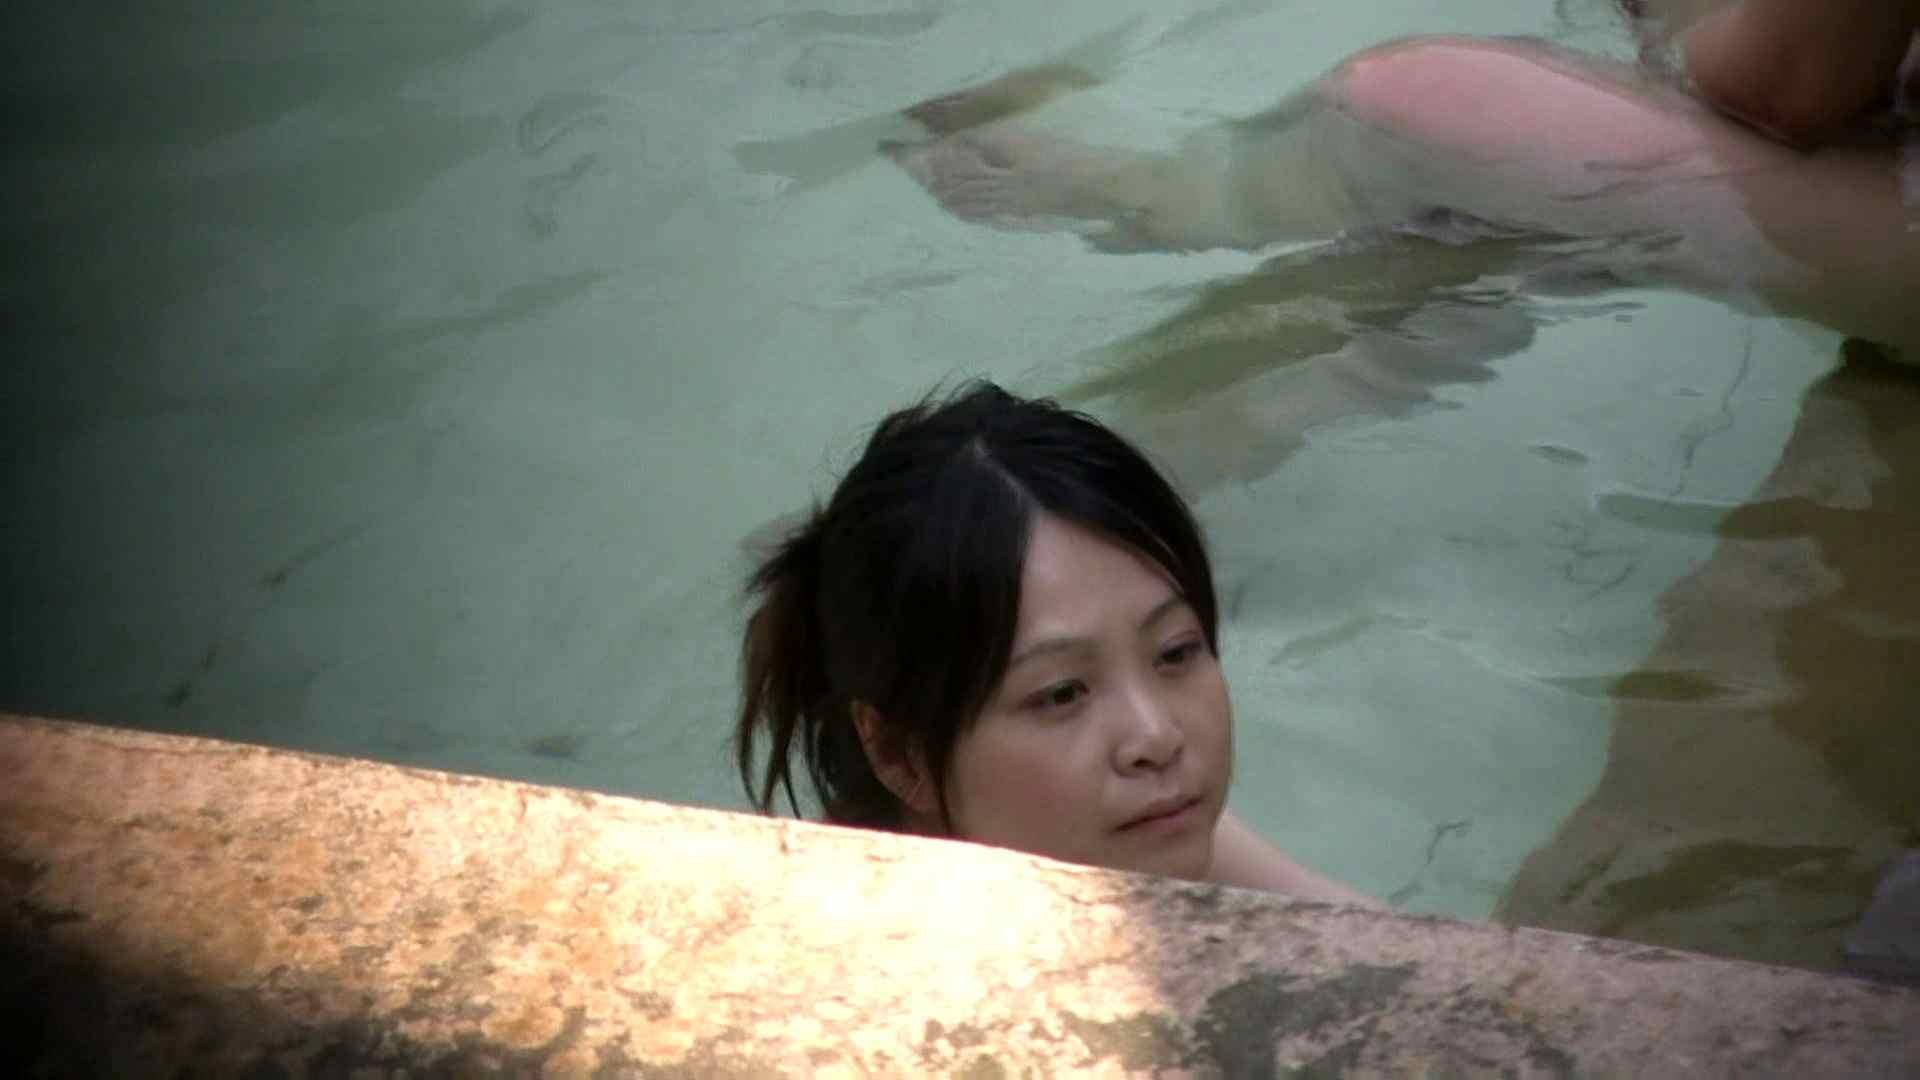 Aquaな露天風呂Vol.652 美しいOLの裸体 SEX無修正画像 79pic 8